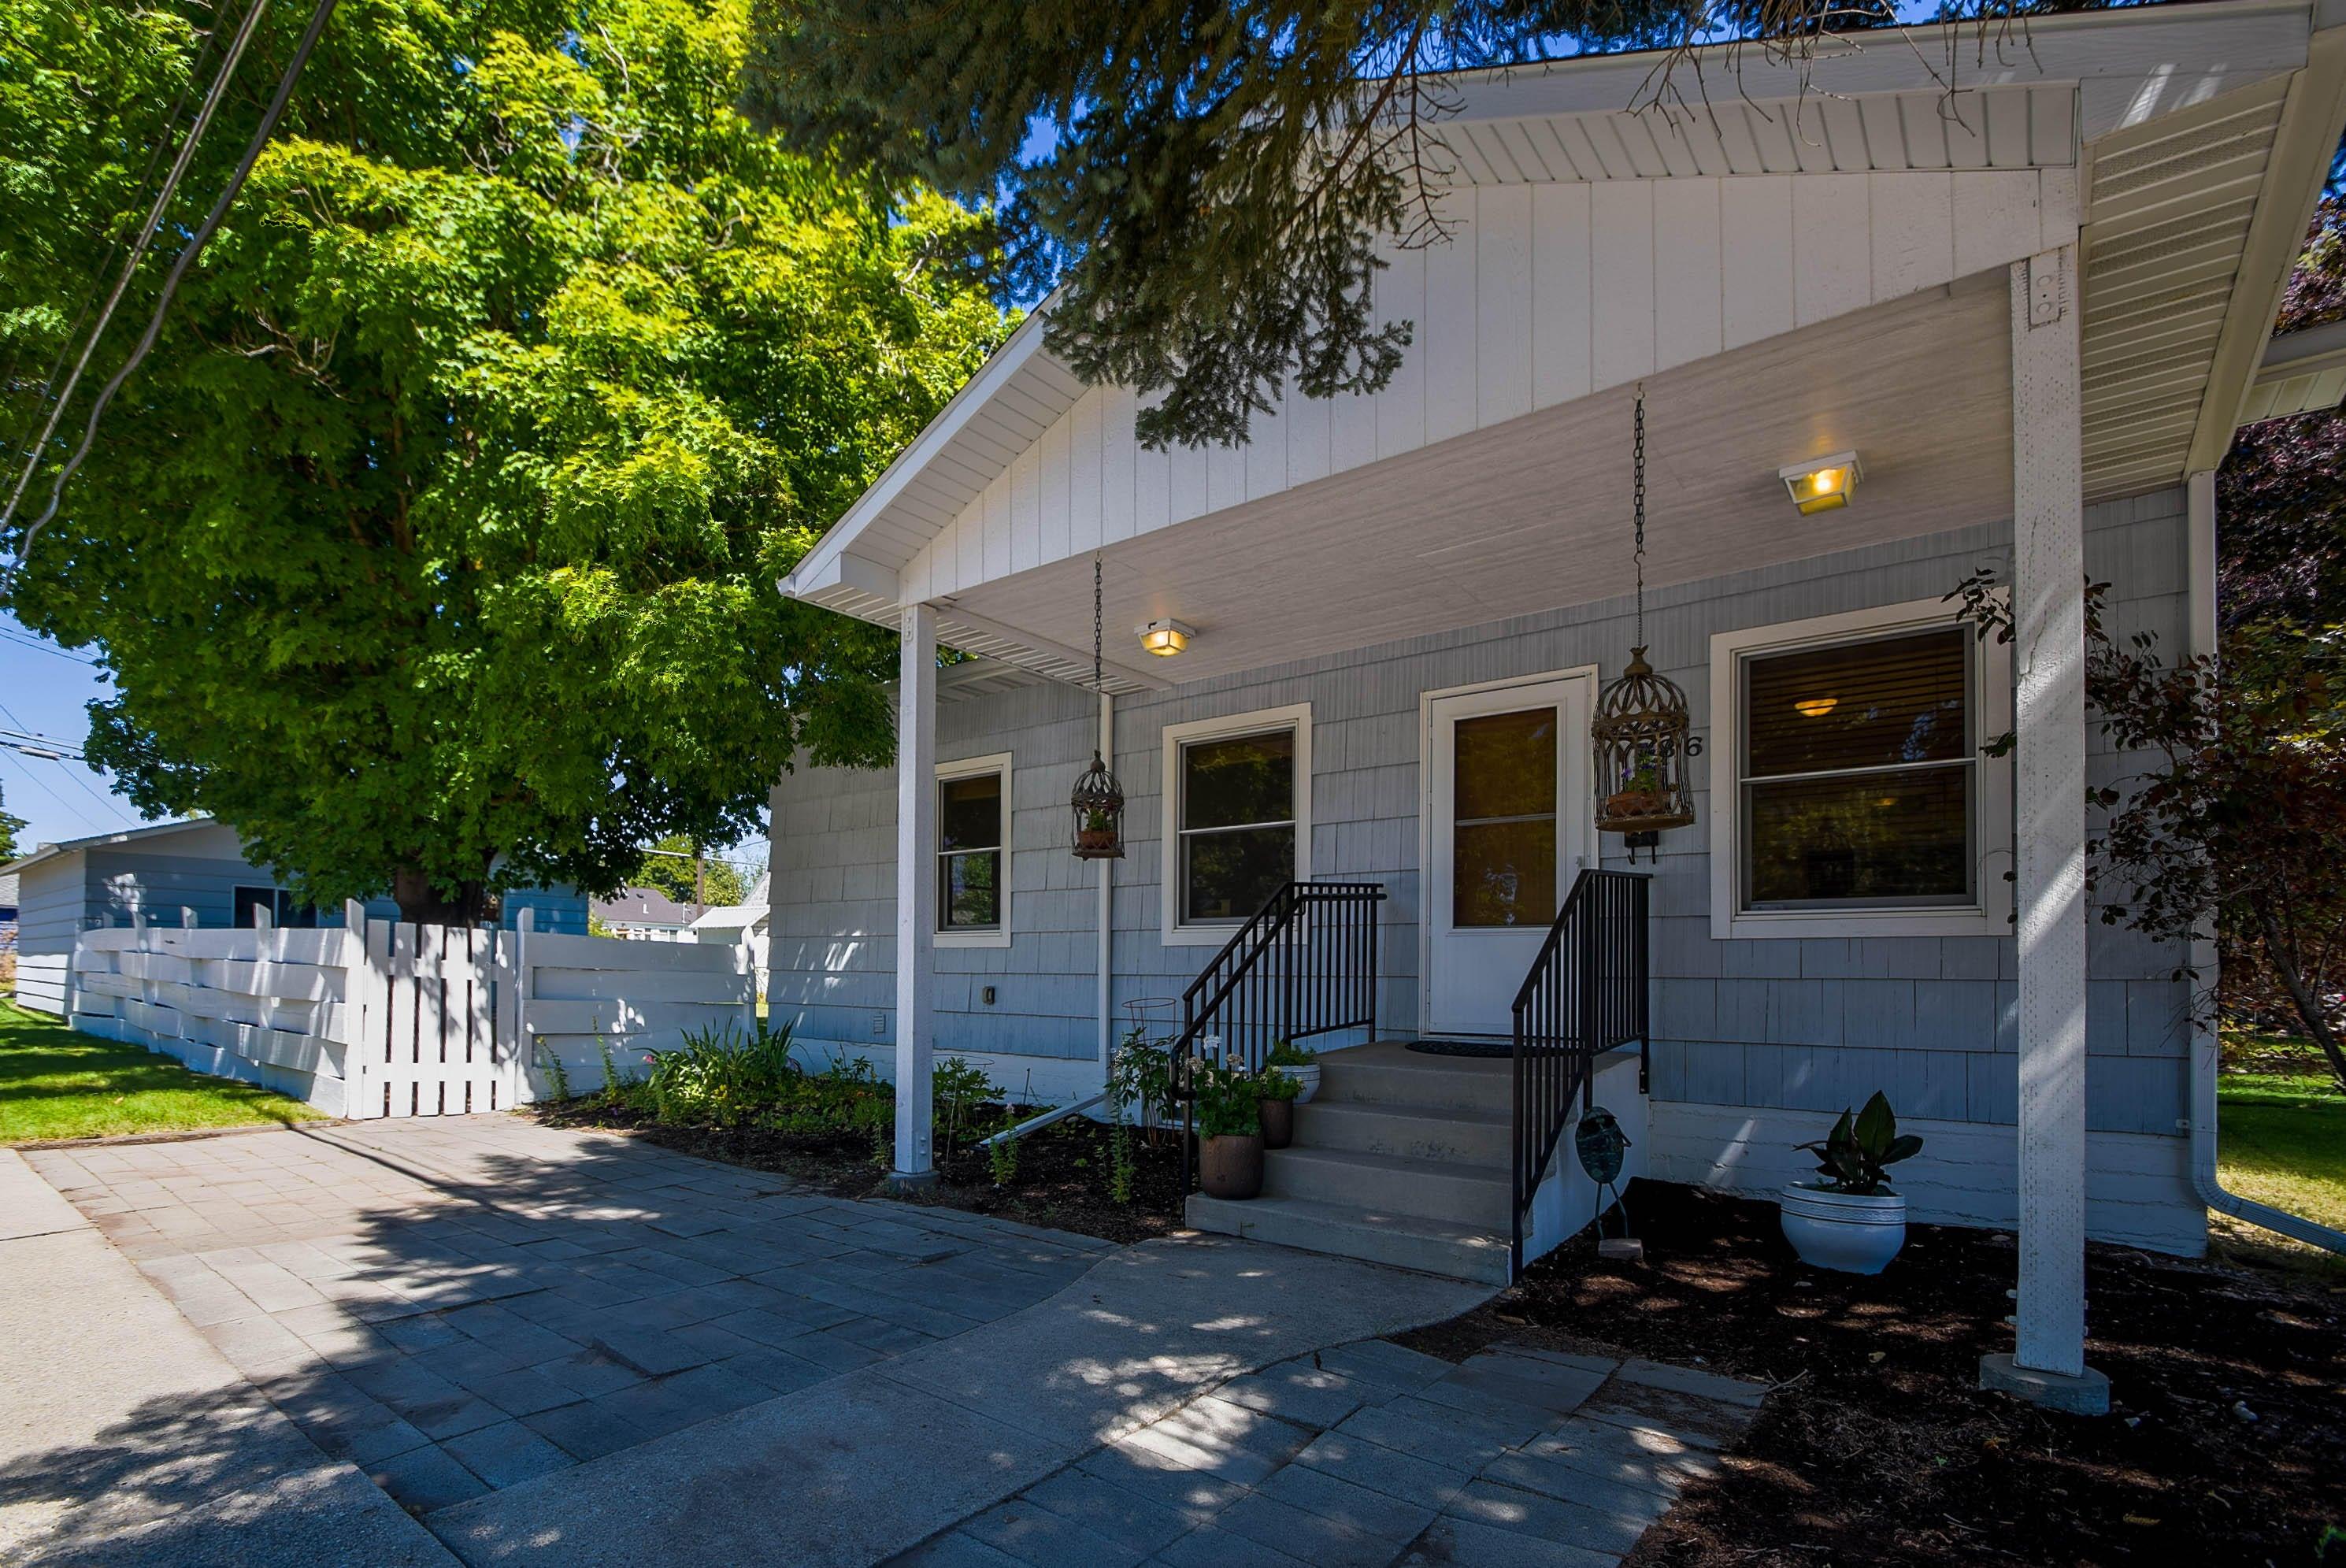 1736 Park Street, Missoula, MT 59801